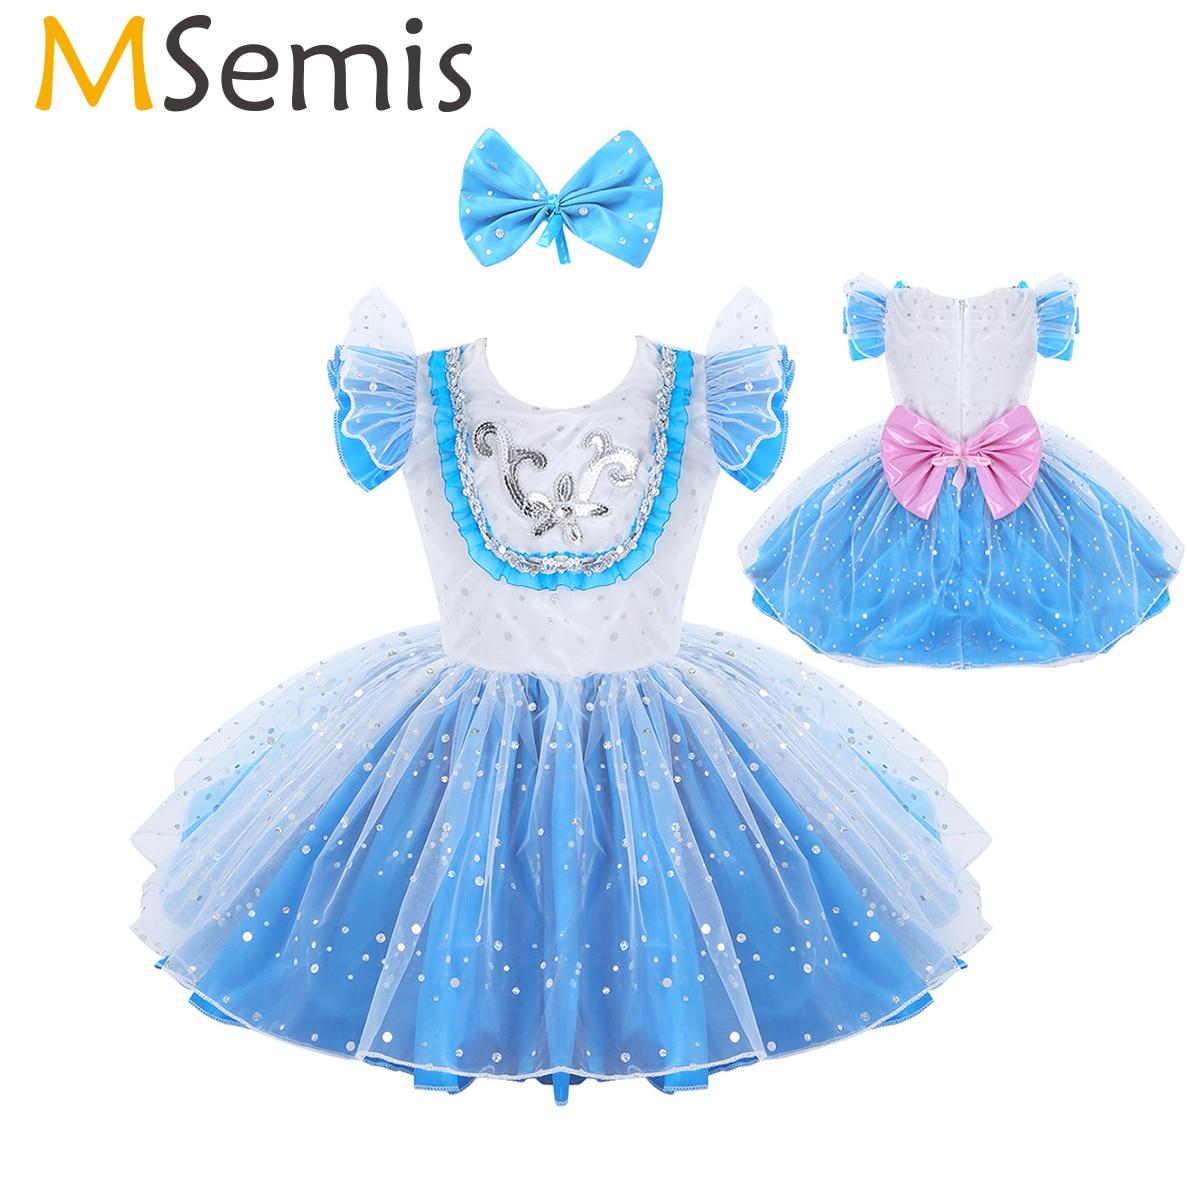 MSemis Kids Girls Modern Dancewear Ballroom Dress Stage Performance Costume Outfit Shiny Sequin Big Bowknot Tutu Dress Hair Clip